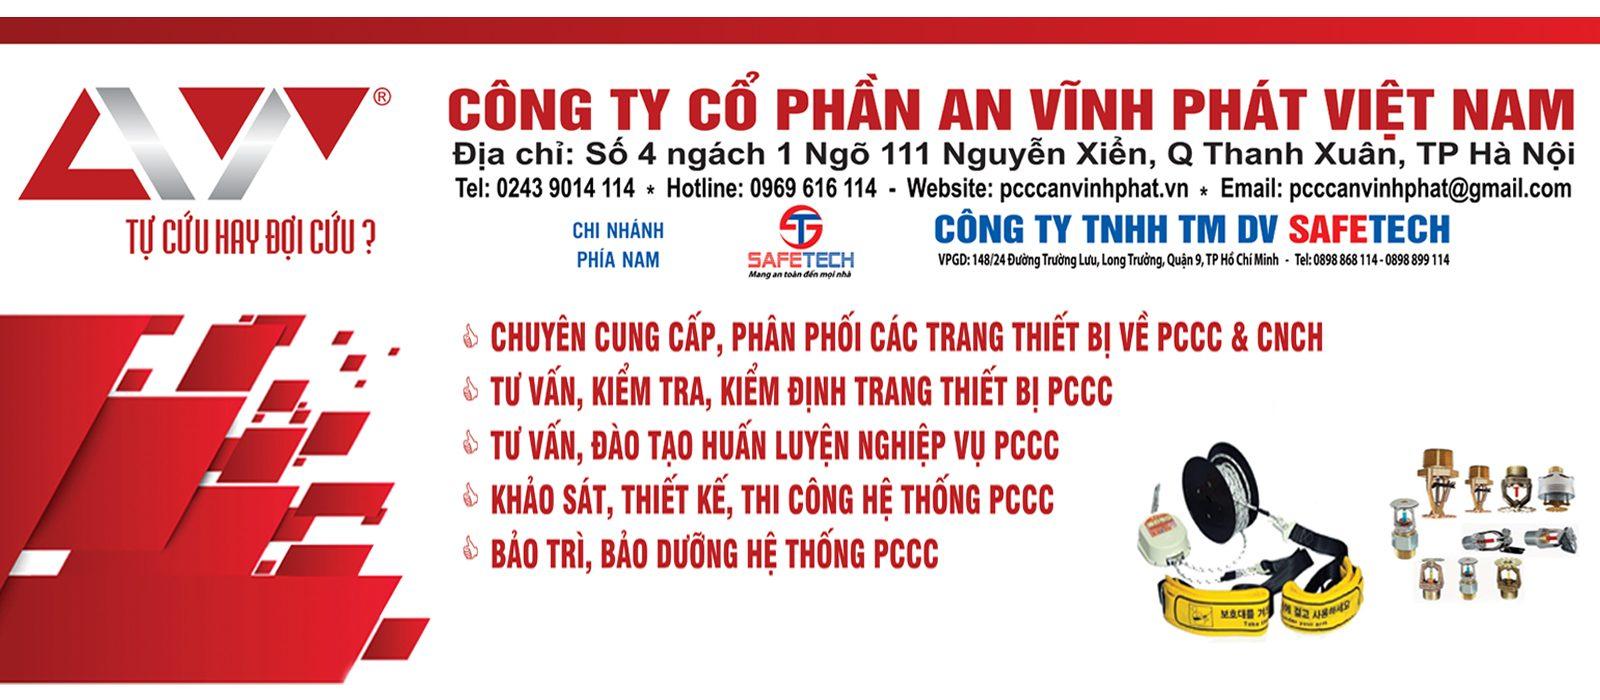 cong ty co phan an vinh phat viet nam